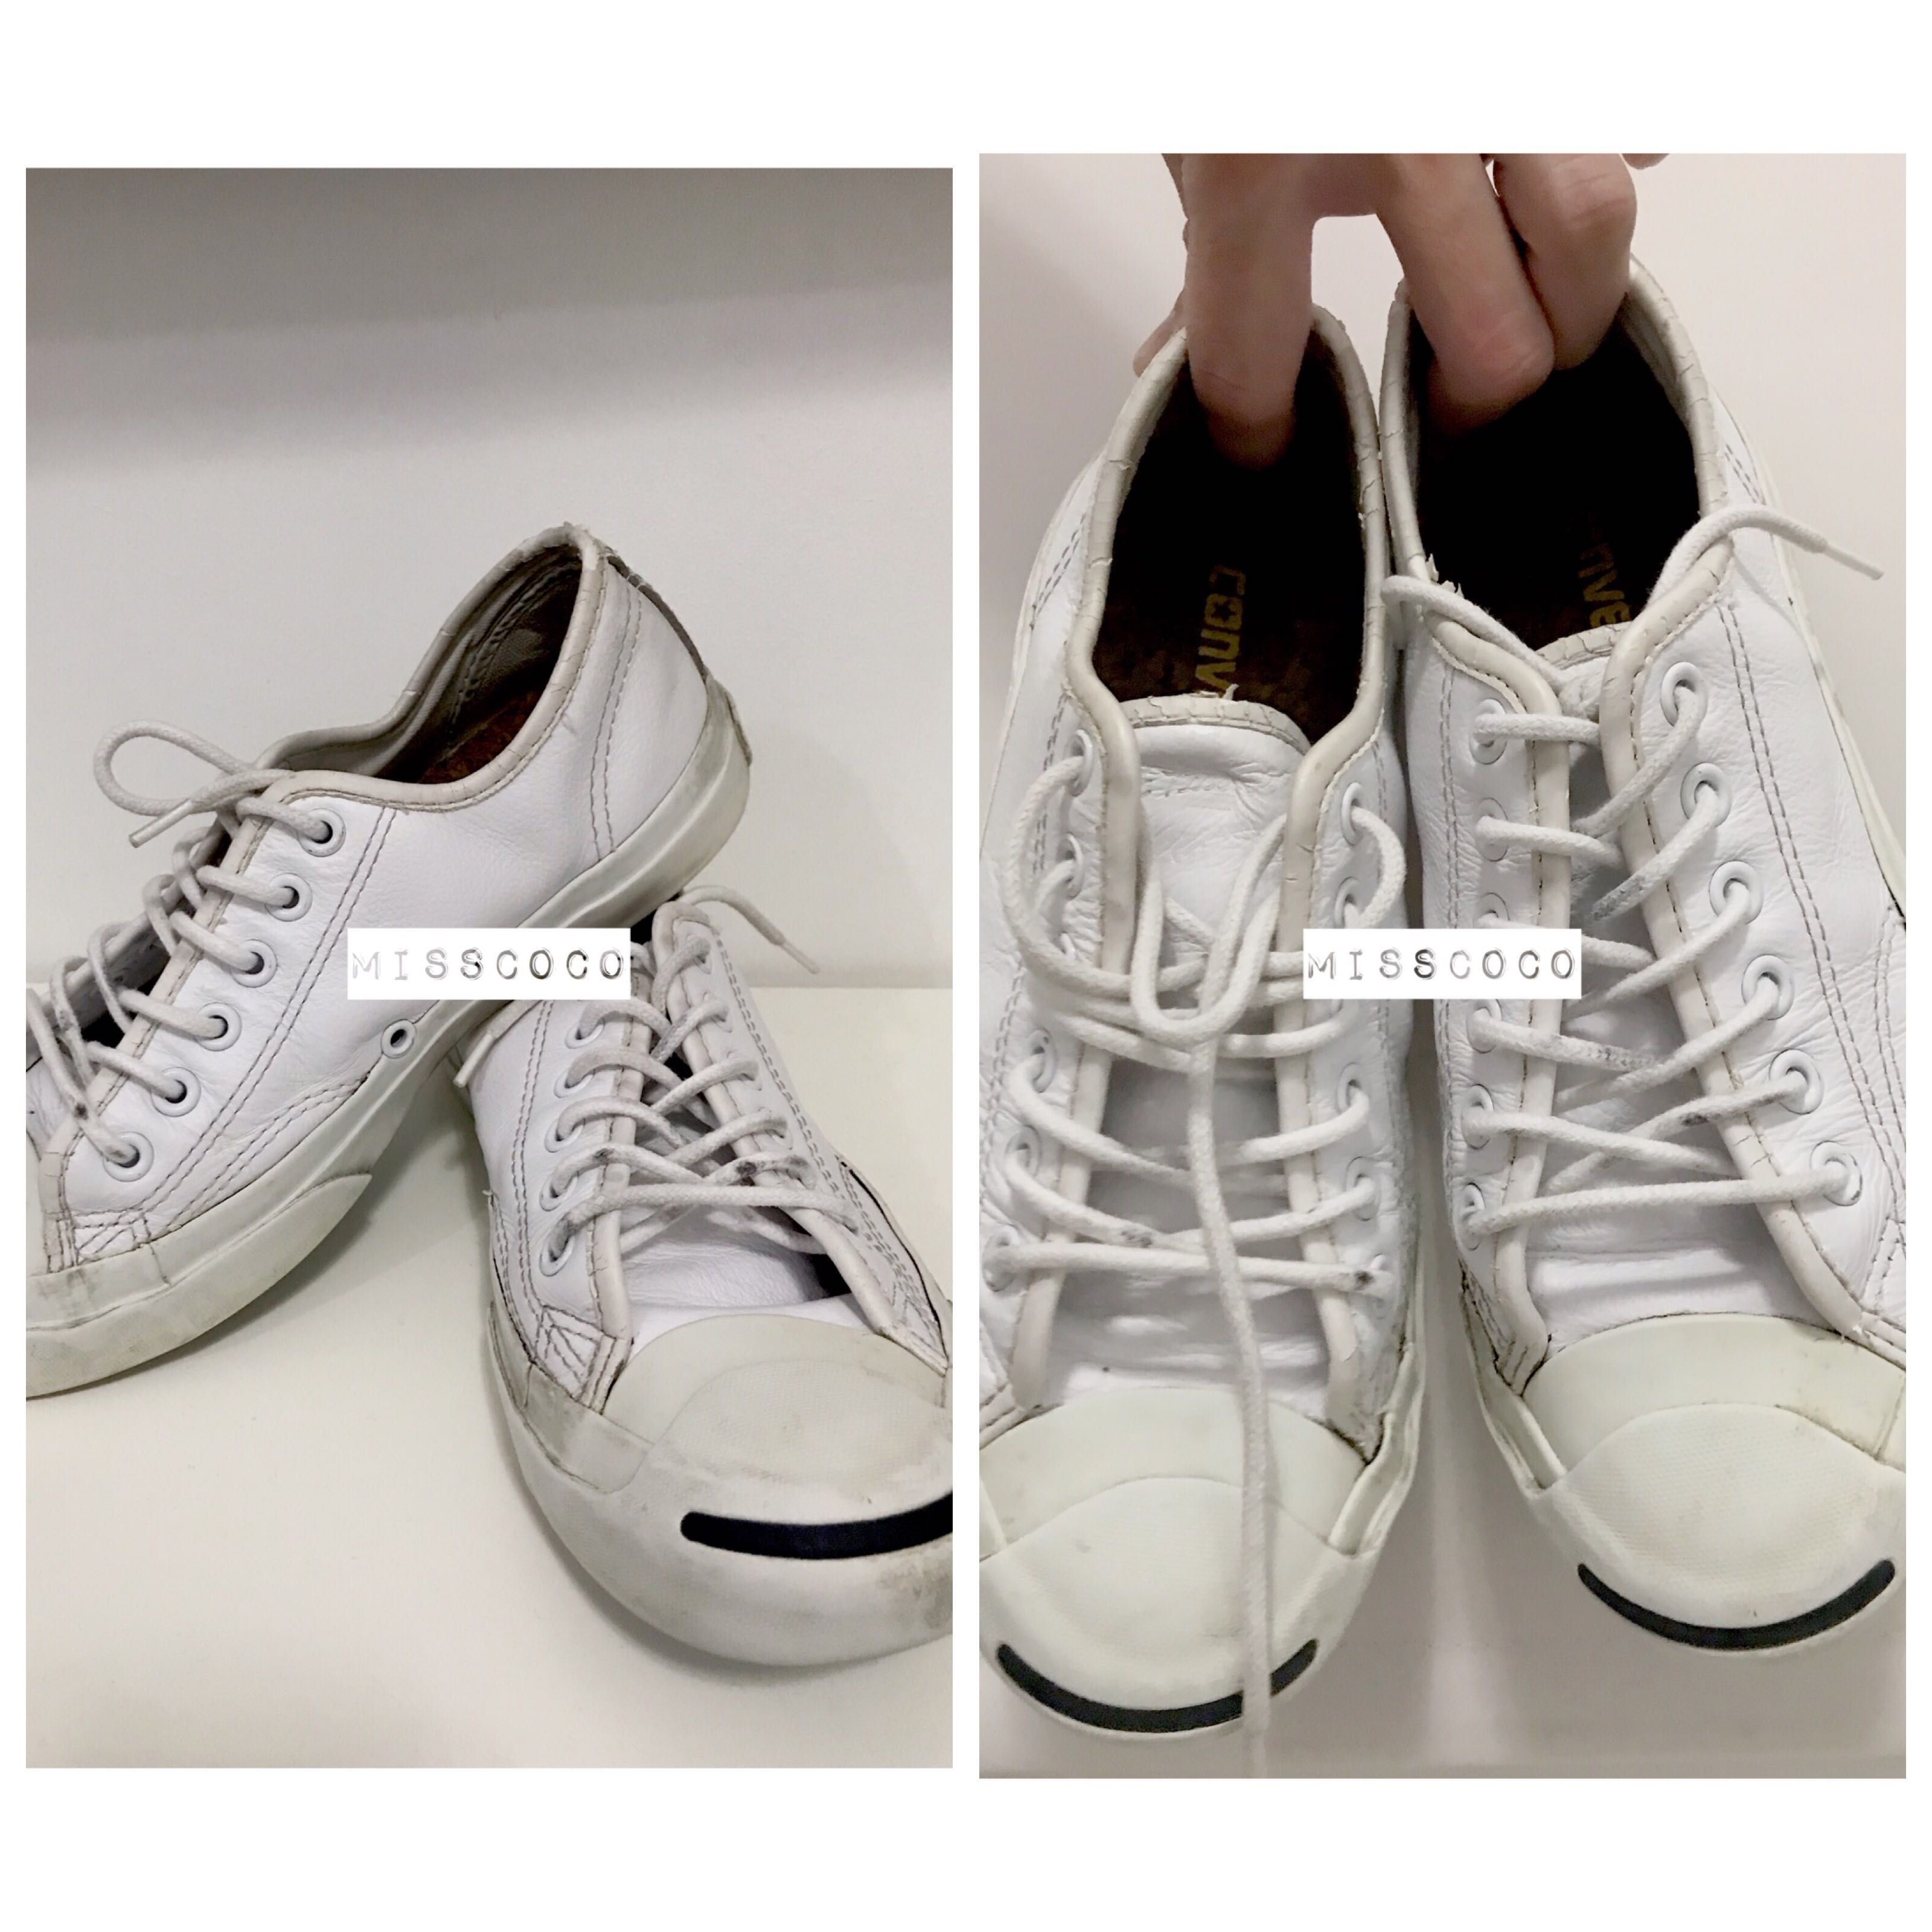 3a85a970155a Home · Women s Fashion · Shoes. photo photo ...